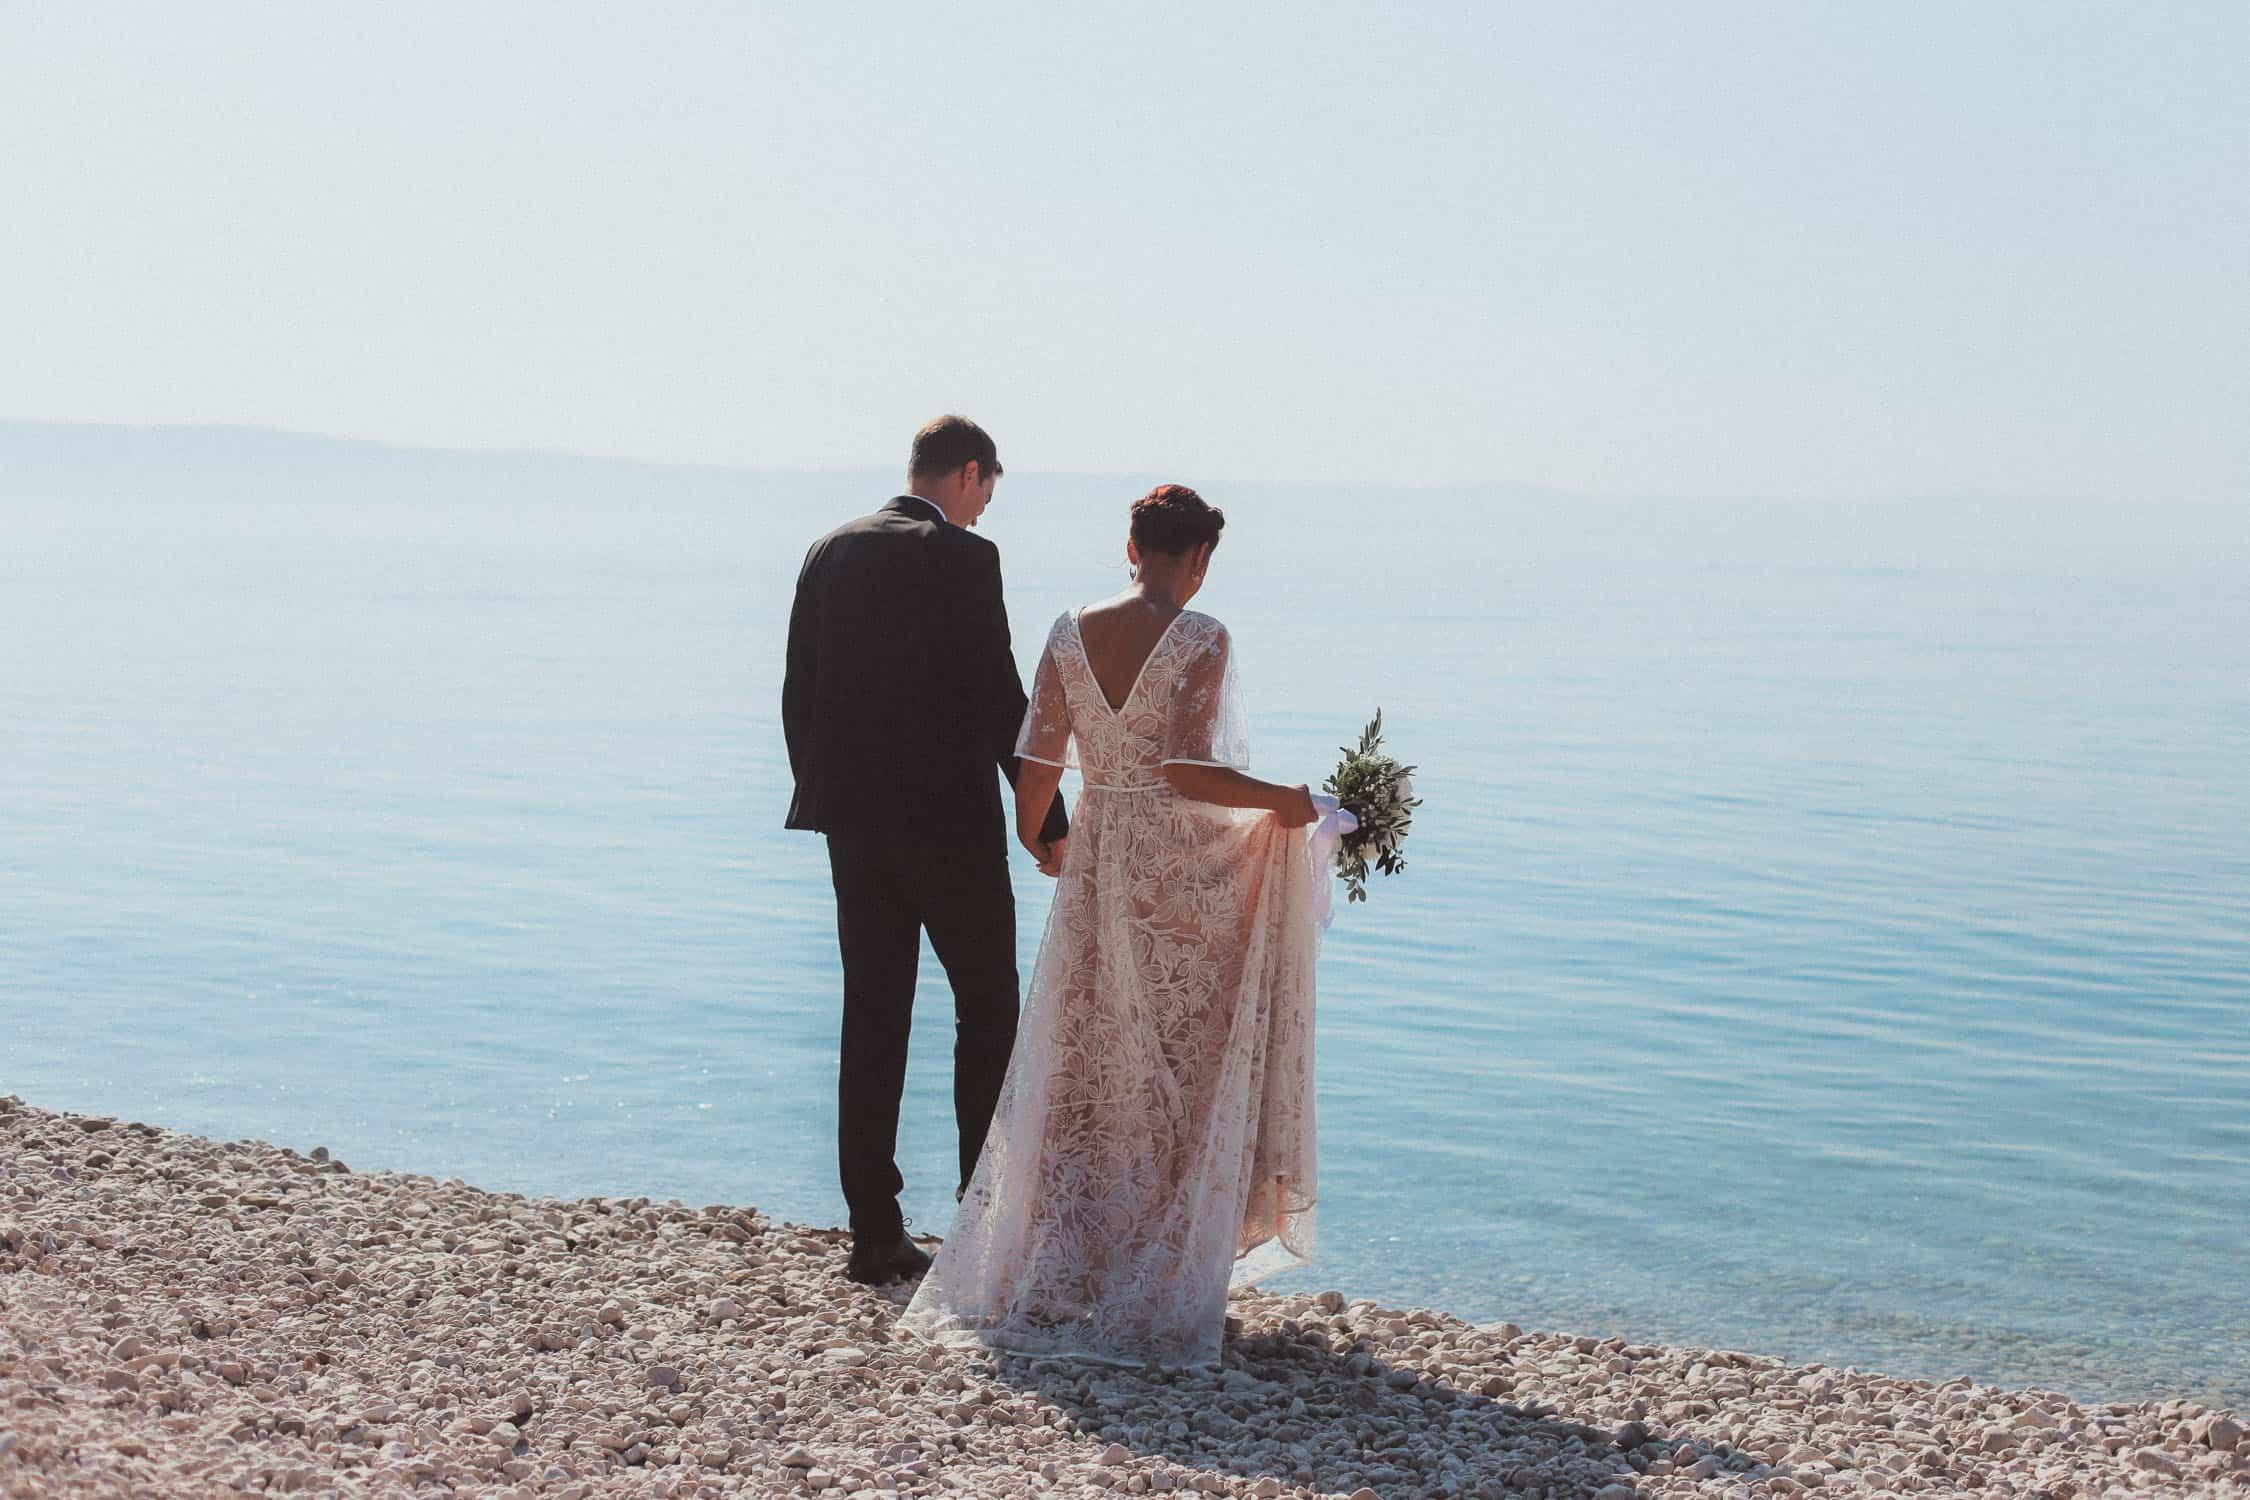 IMG 0420 | Croatia Elopement Photographer and Videographer